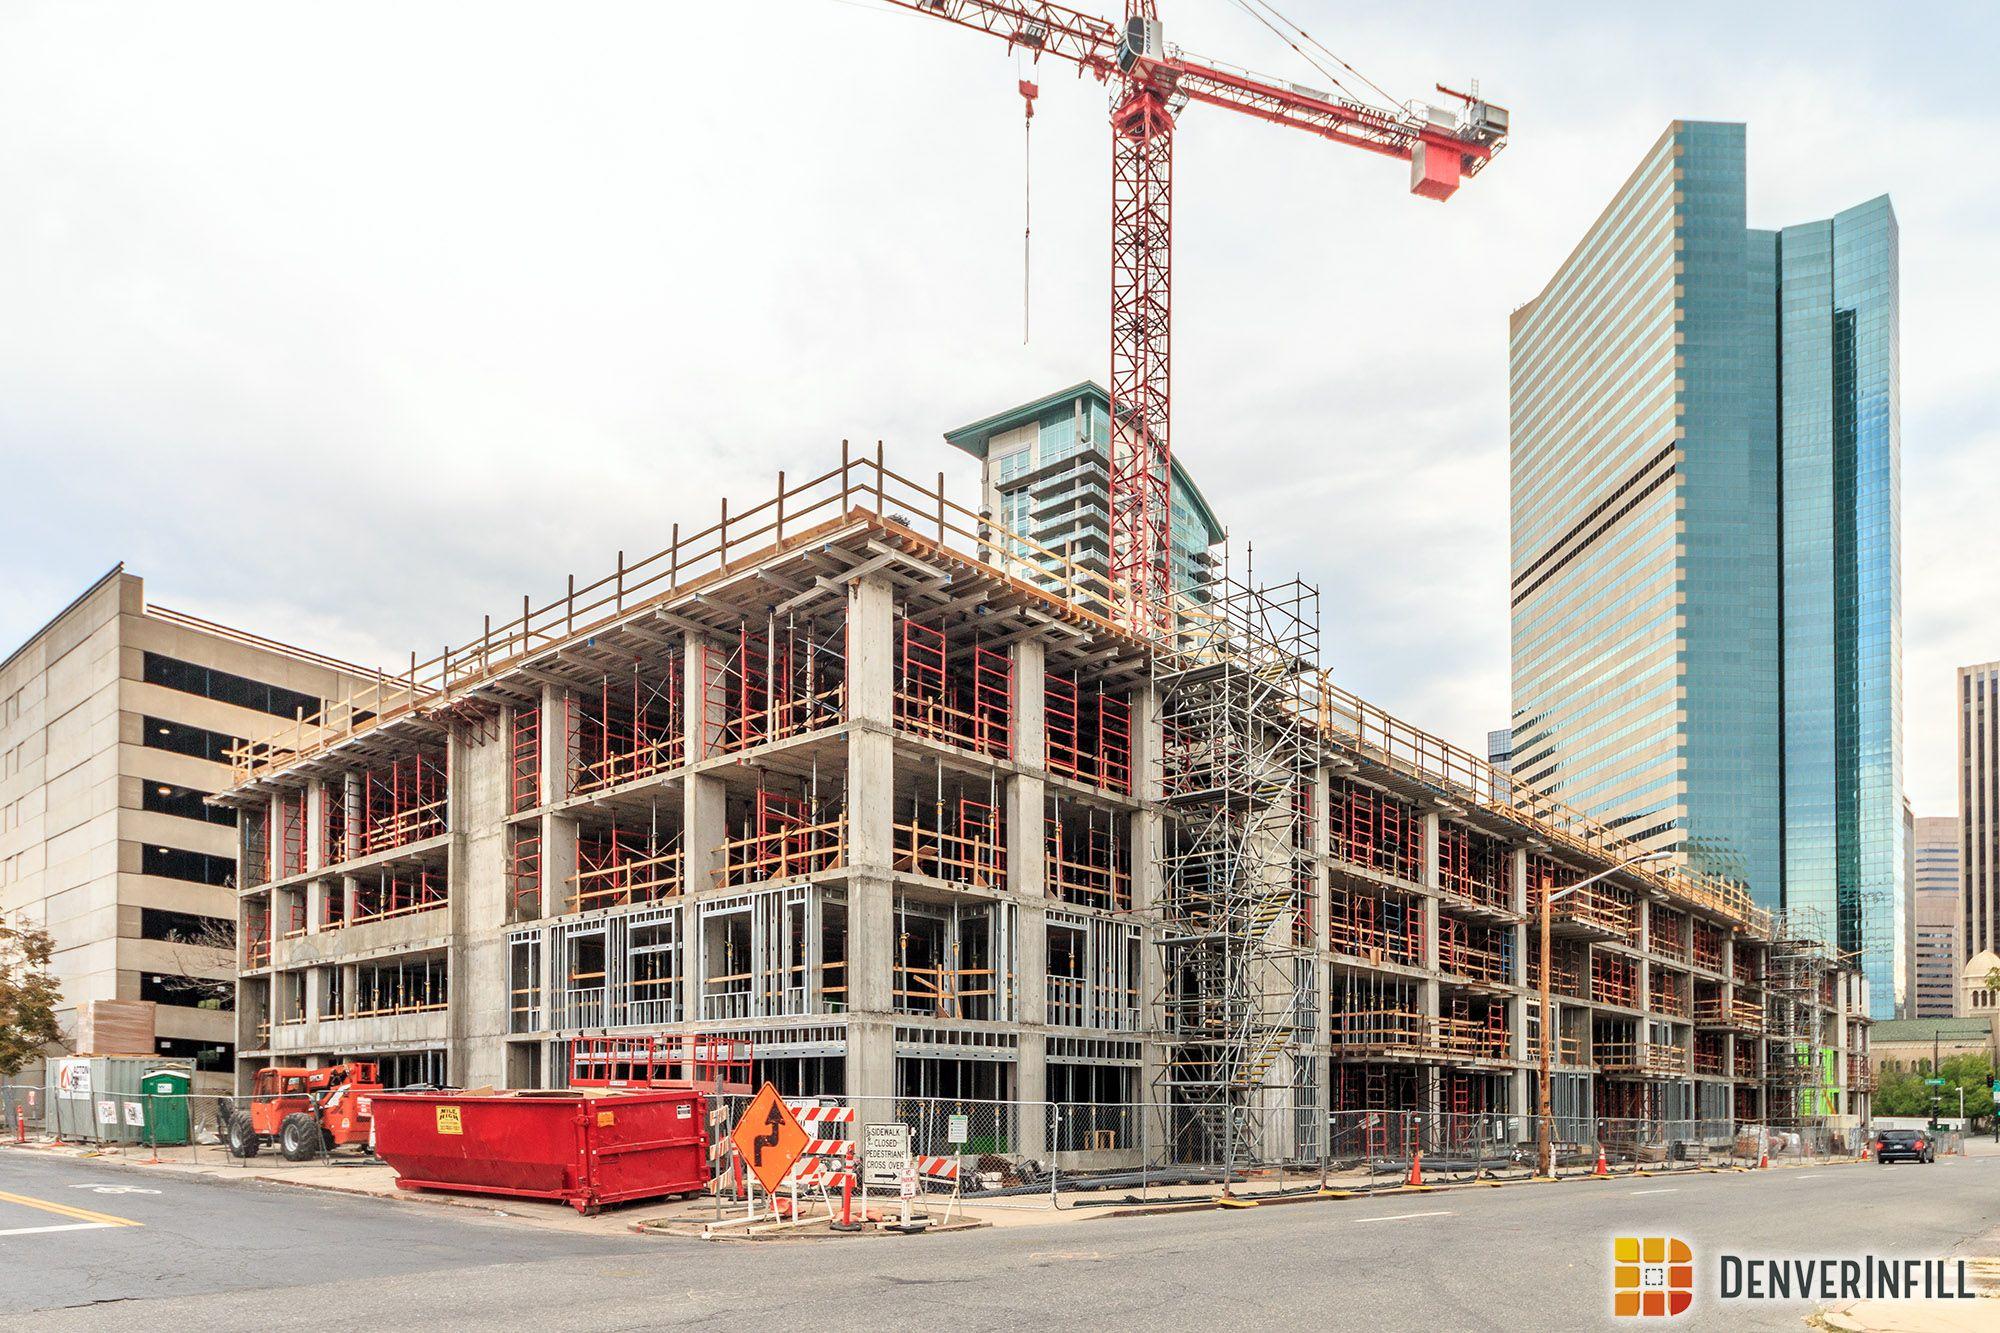 Alexan 20th Street Station Update 2 in 2019 Street